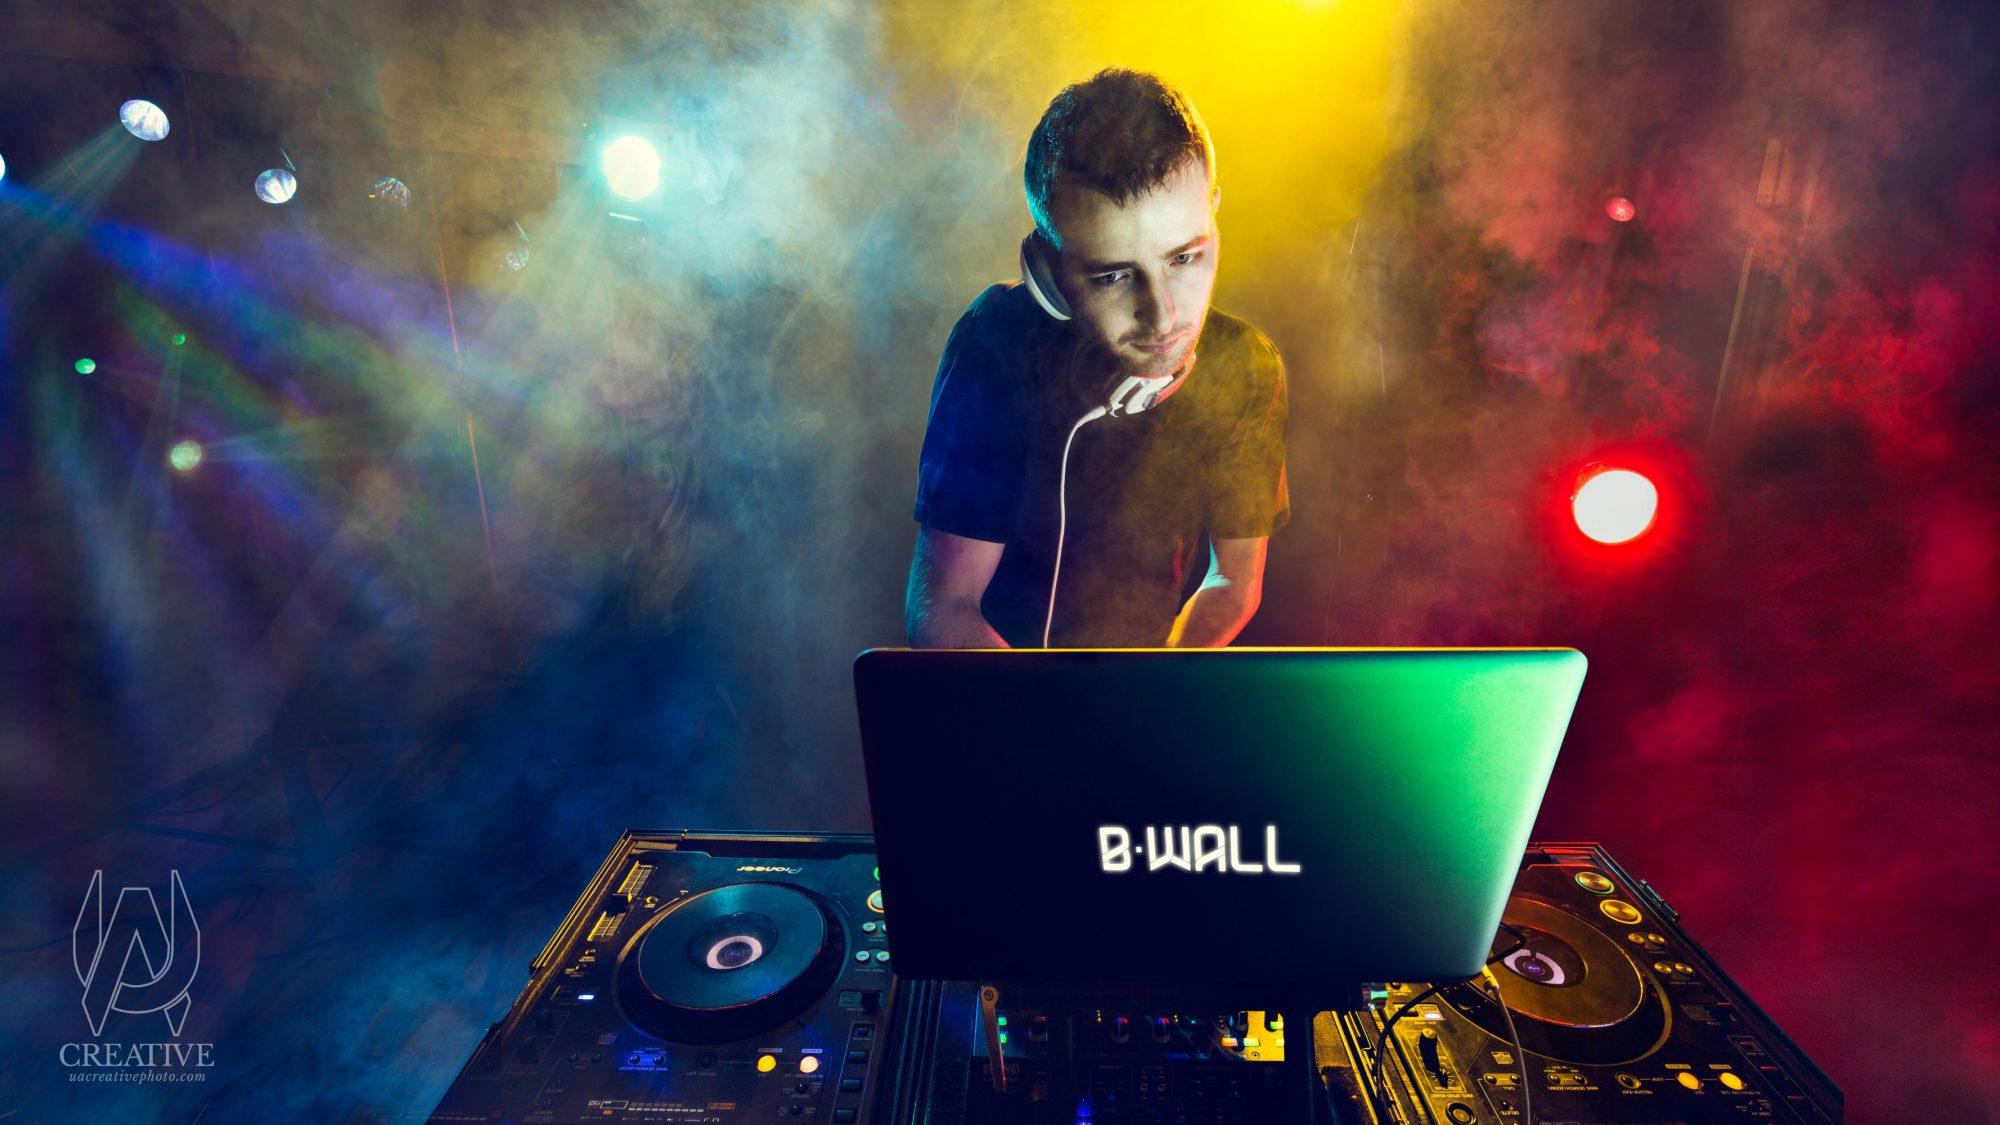 DJ B-Wall, Creative, Columbus Production Studio, UA Creative Studios, Ua Chamberlain, Photography, Portraiture, Columbus, Ohio